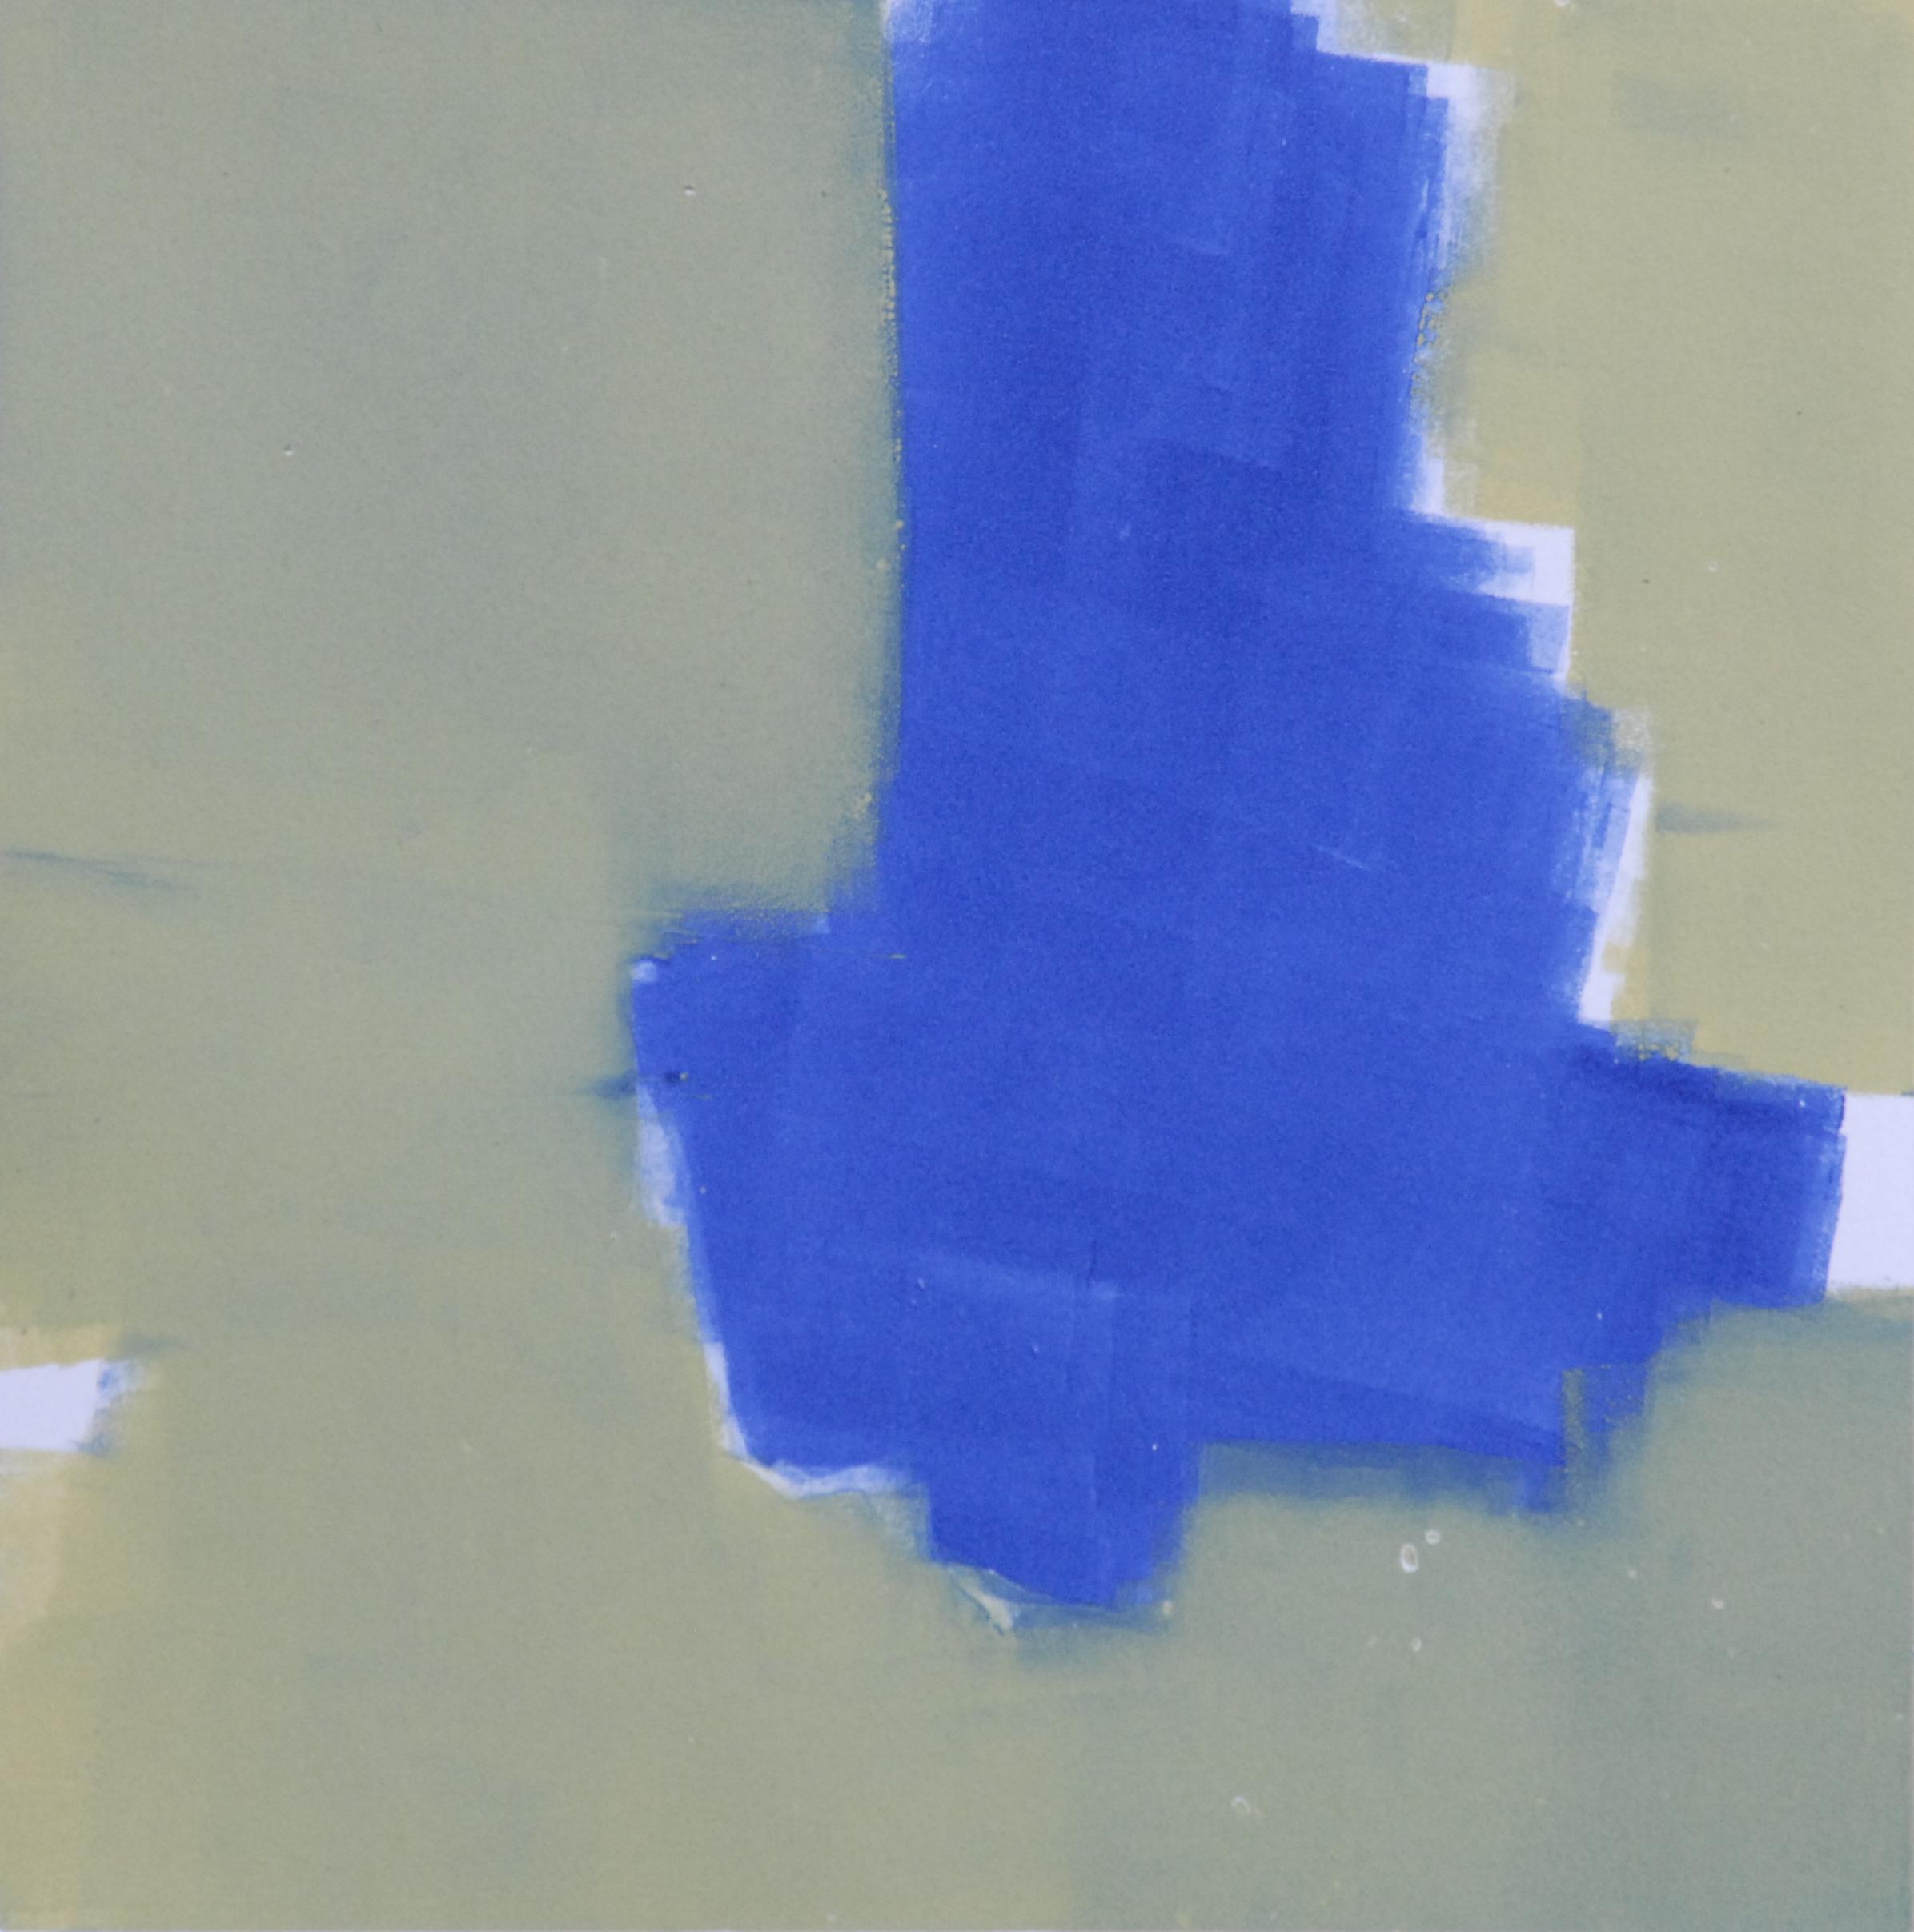 "Sodium Deviation 16, 2016  monoprint  10"" x 10"" image on 11"" x 14"" paper"